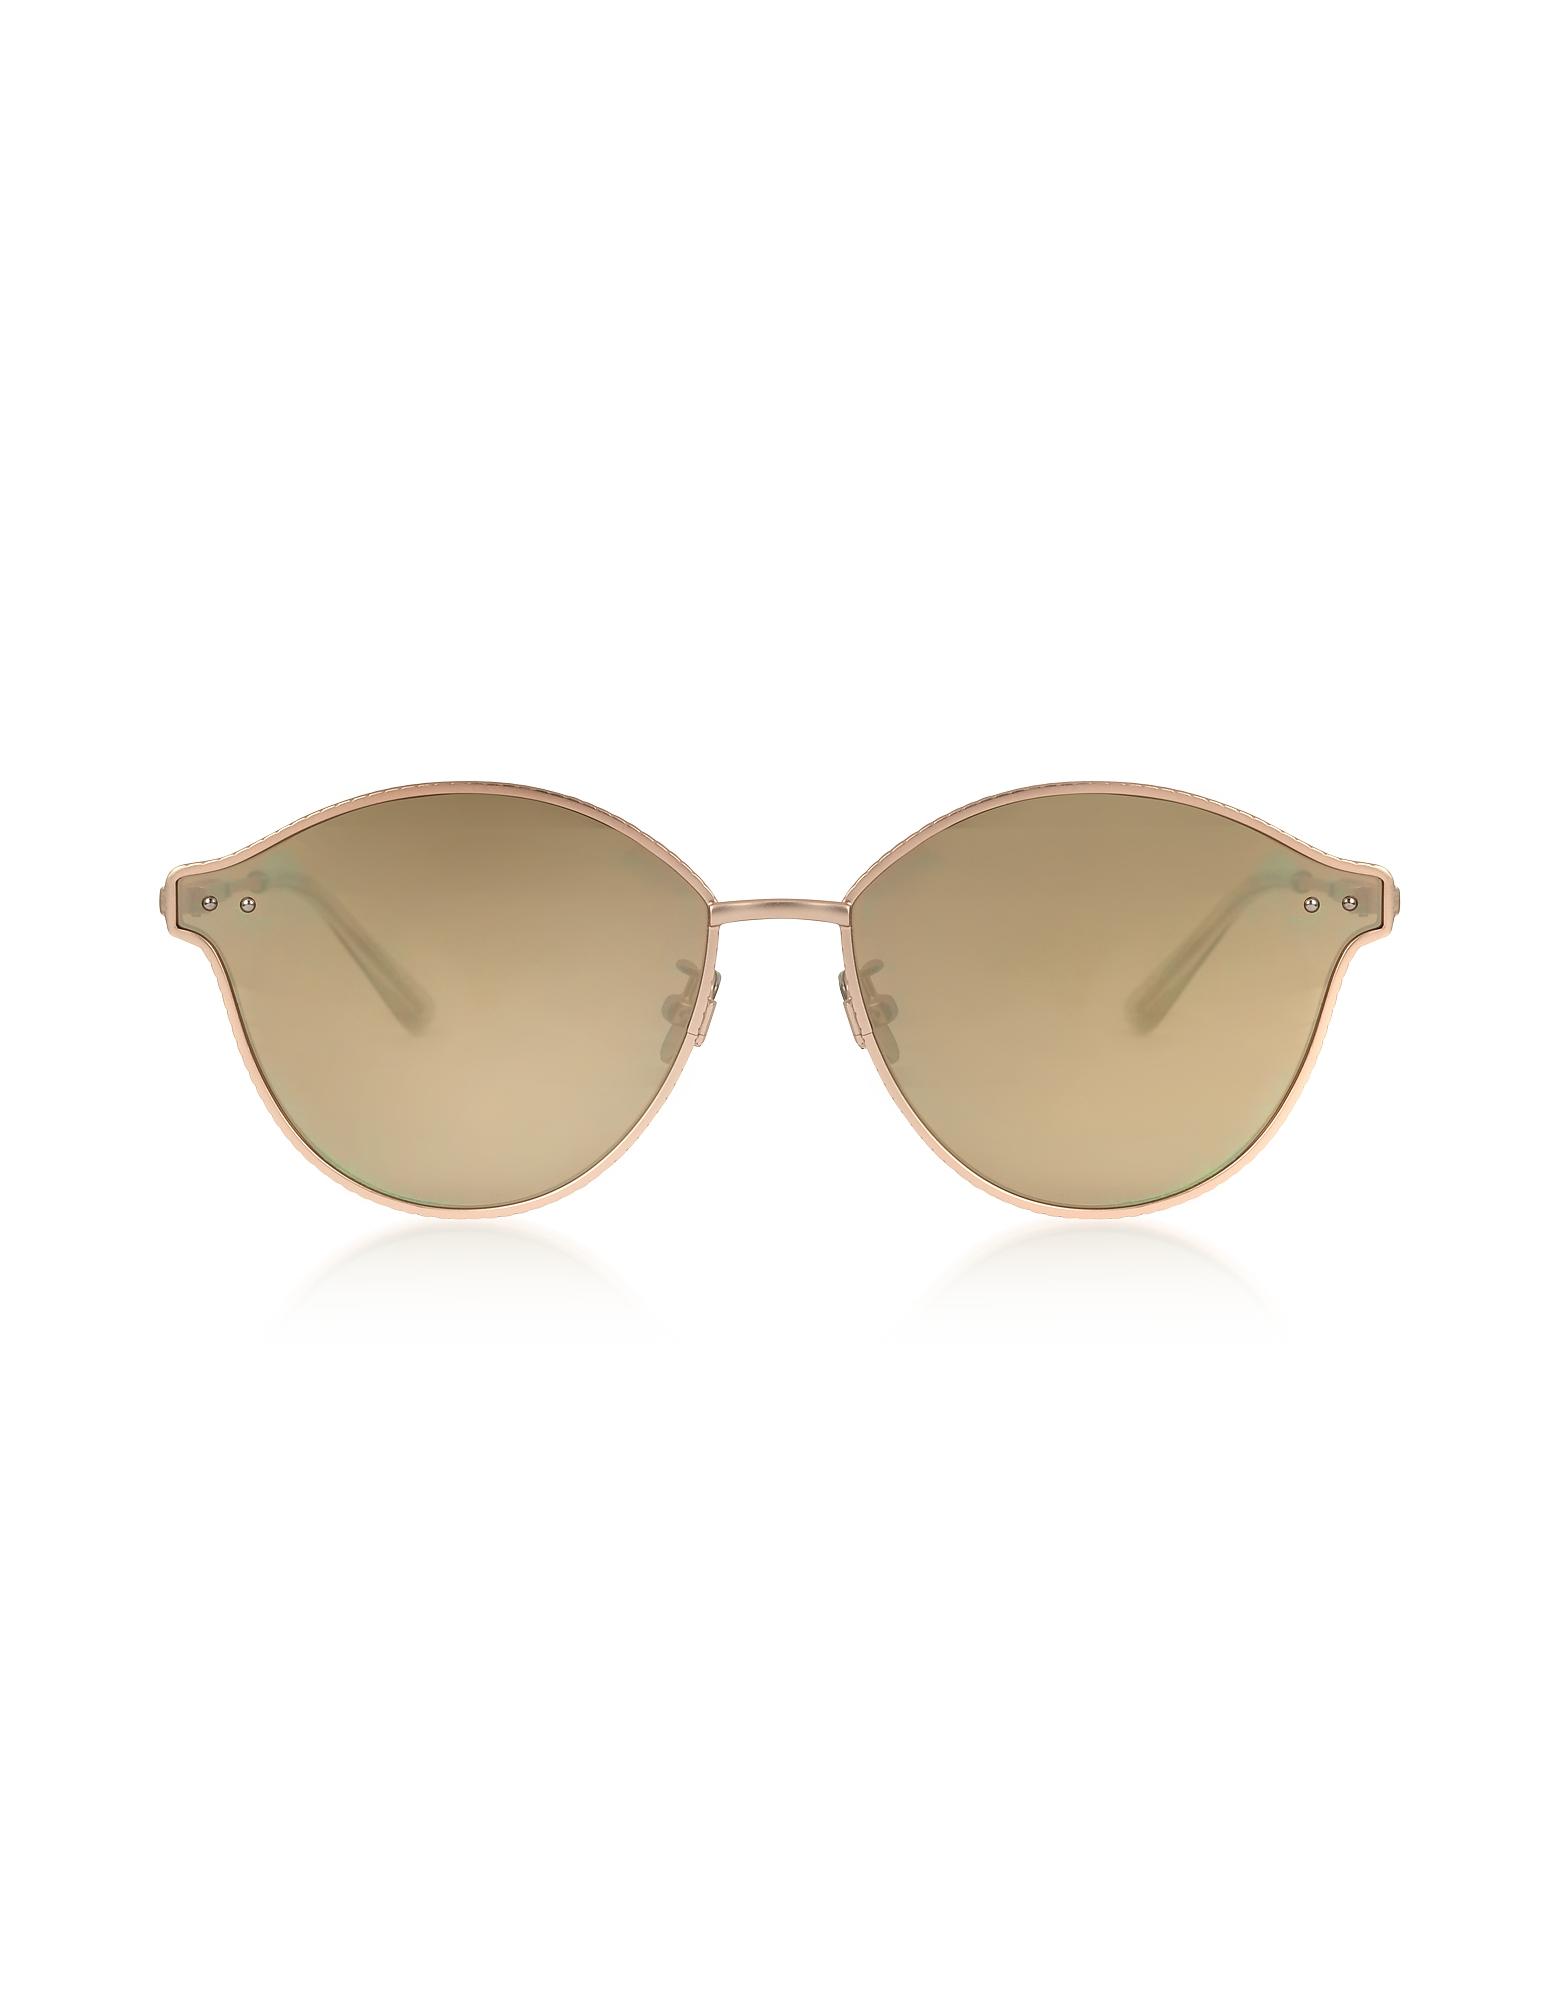 Bottega Veneta Sunglasses, BV0139S 004 Golden Metal Unisex Sunglasses